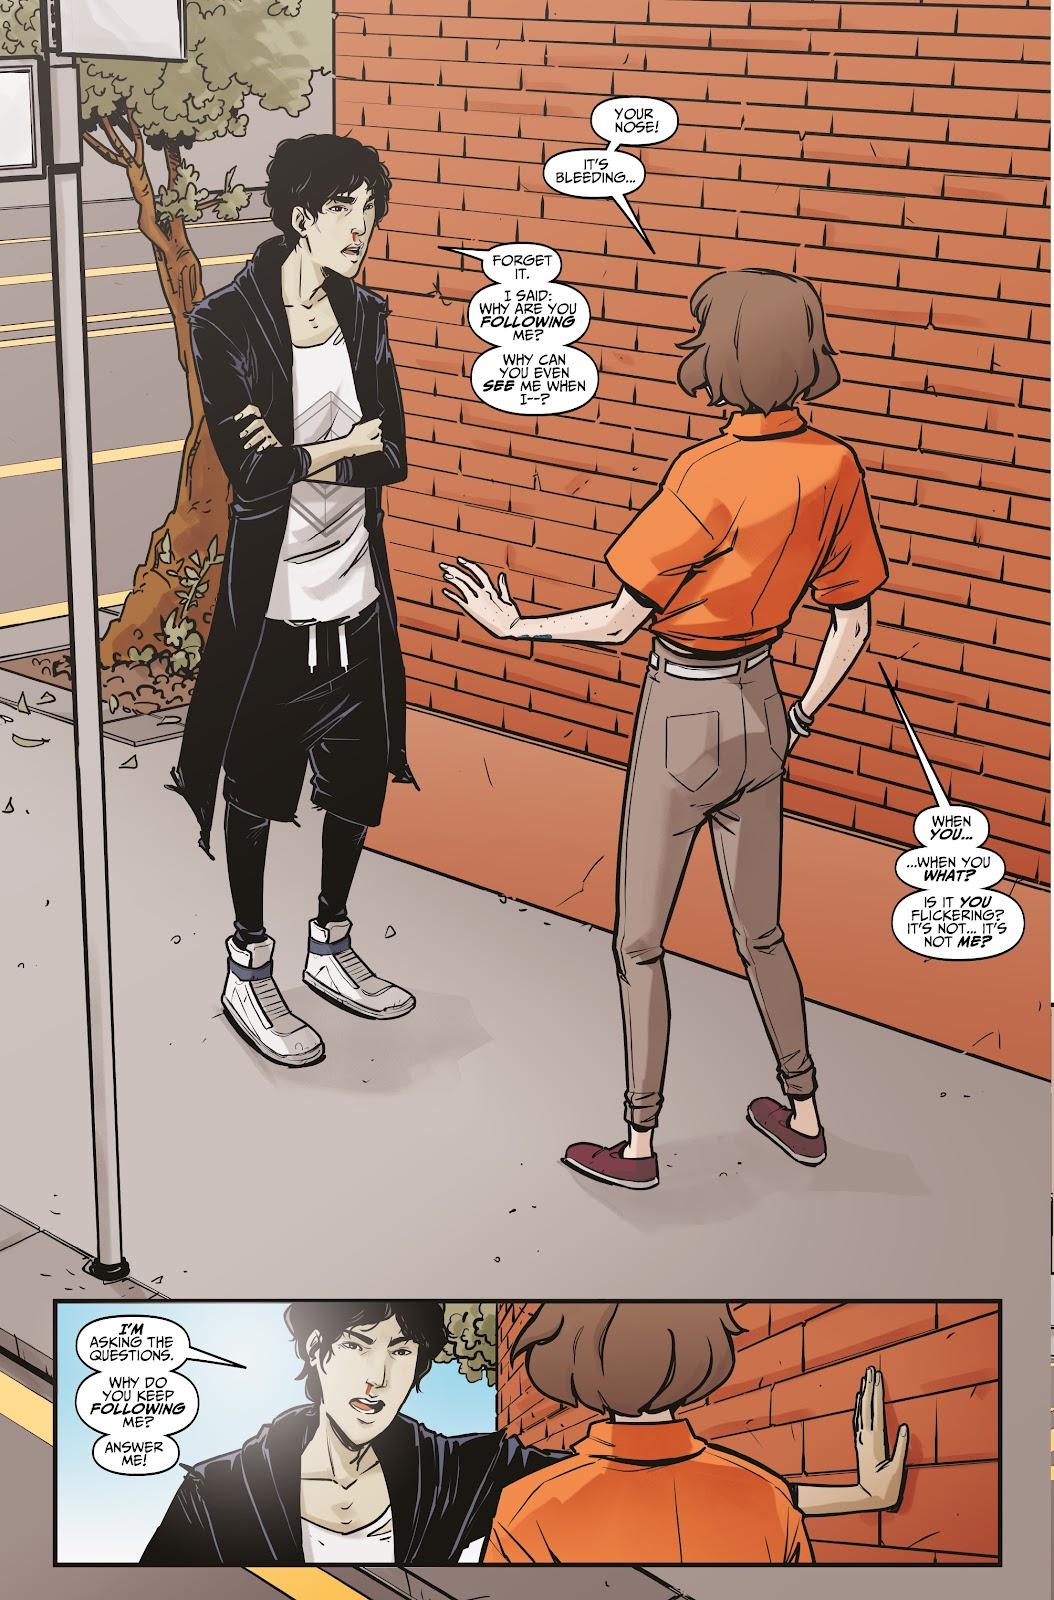 Read online Life is Strange comic -  Issue #6 - 16